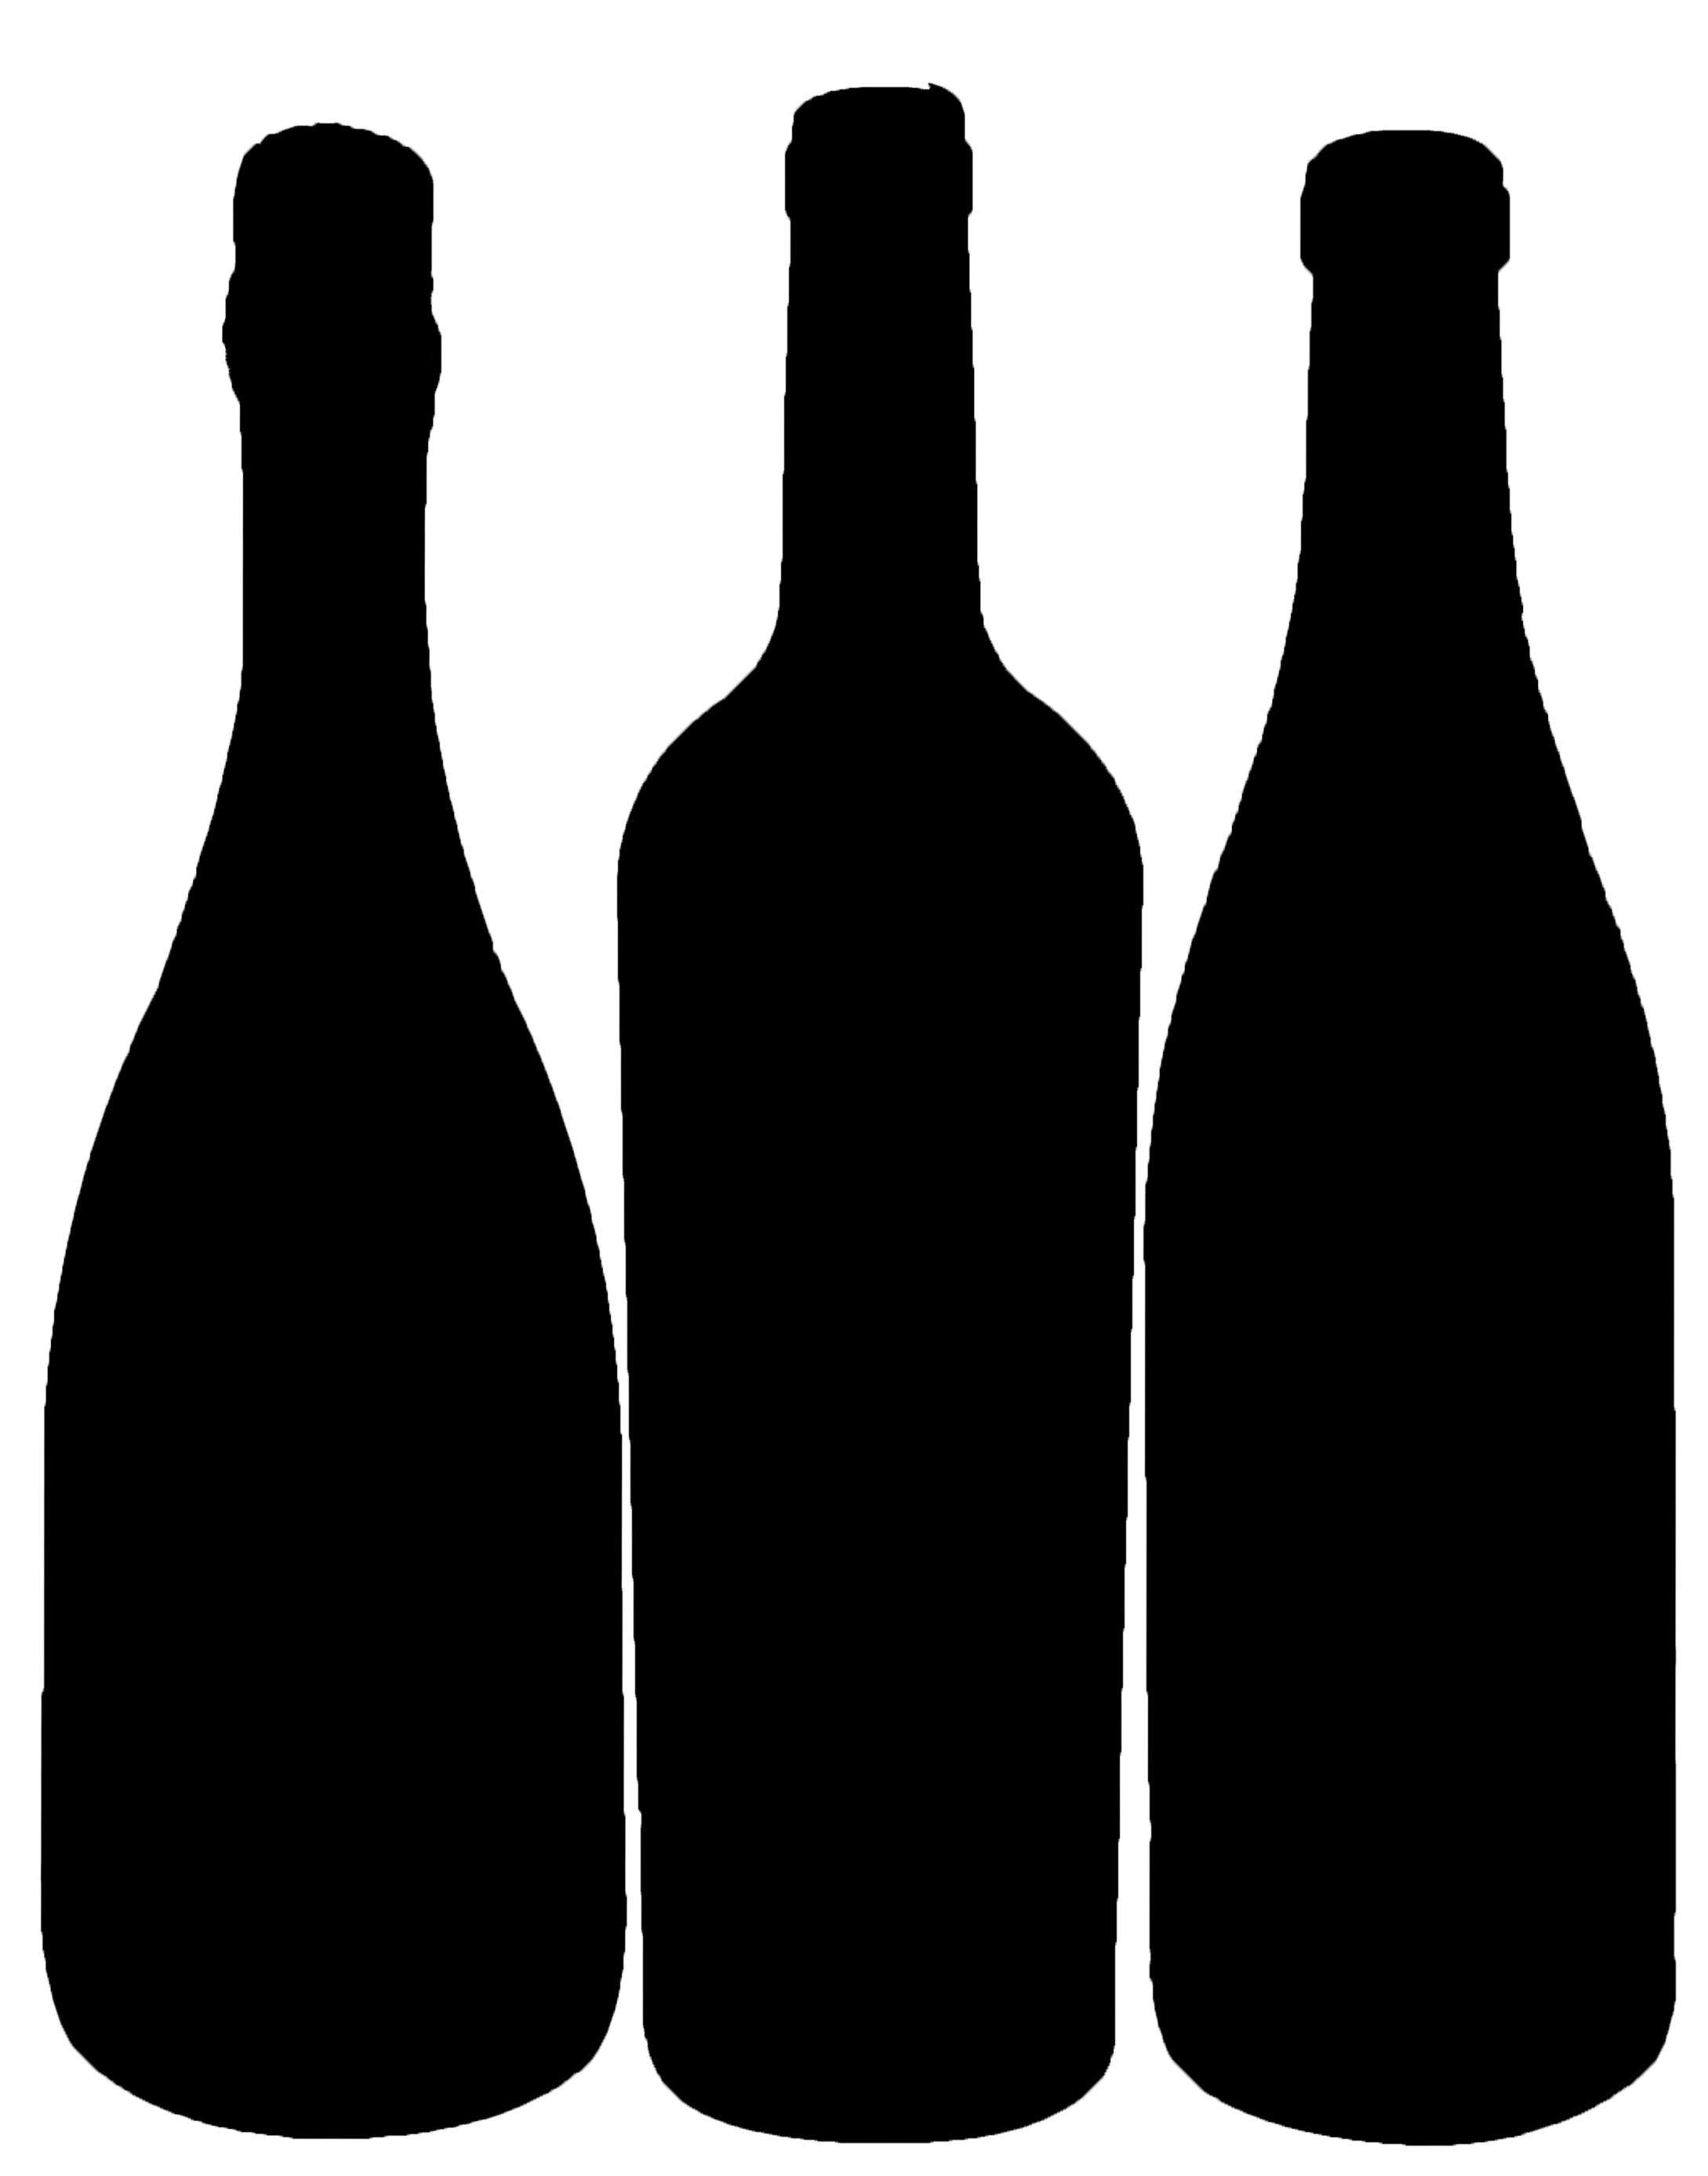 Beer clipart silhouette. Bottle cameo svg pinterest